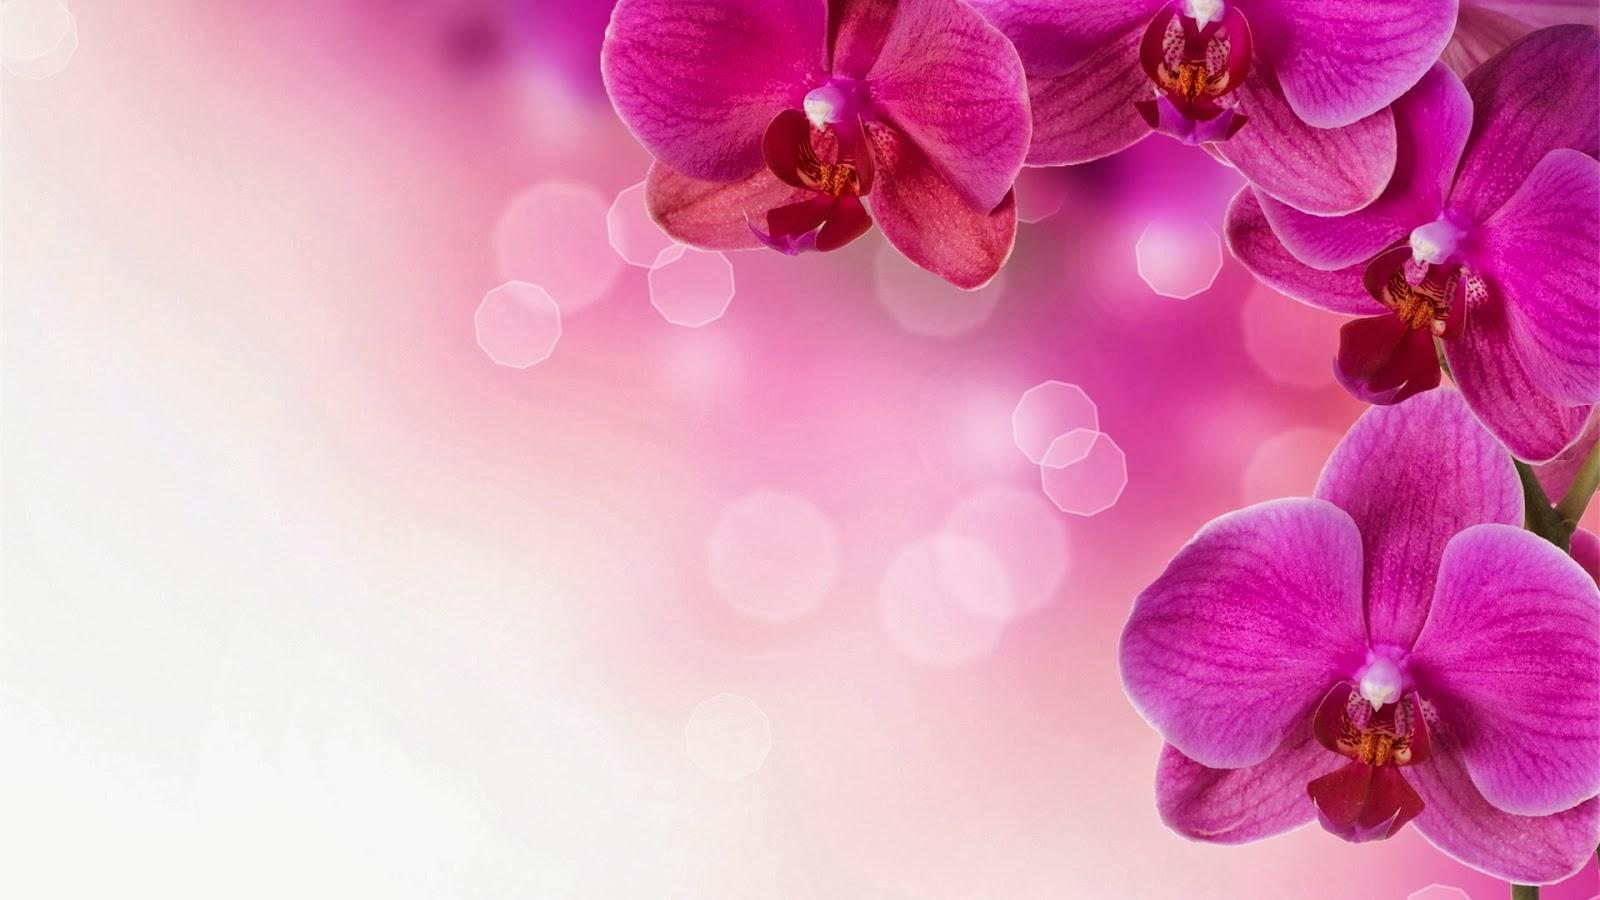 Gambar Pemandangan Wanita Cantik Toko FD Flashdisk Flashdrive